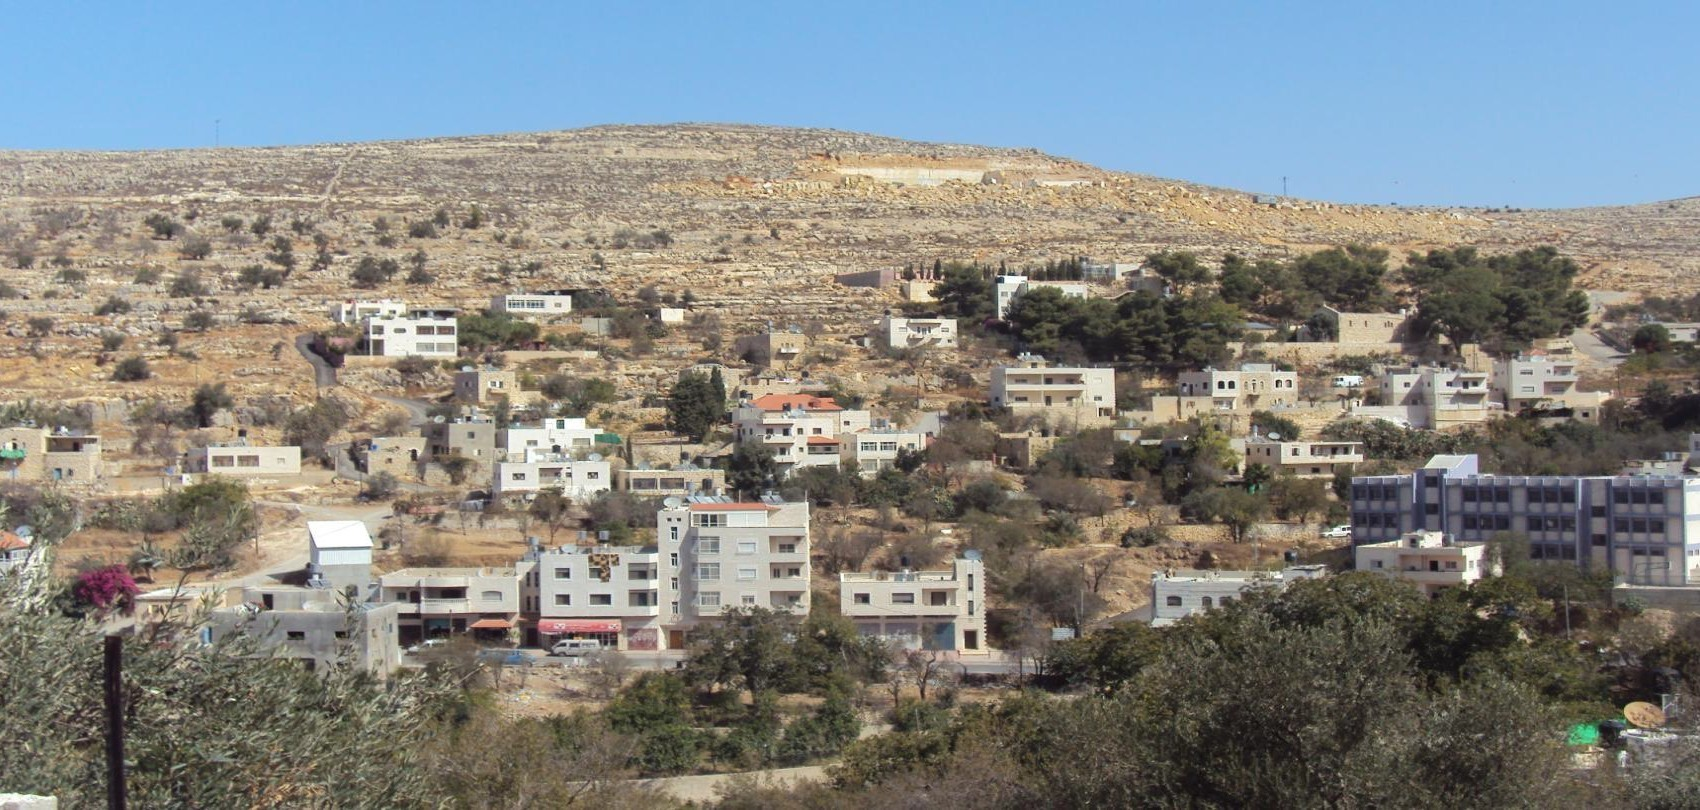 Ayn Arik - قرية عين عريك - Ramallah - Palestine